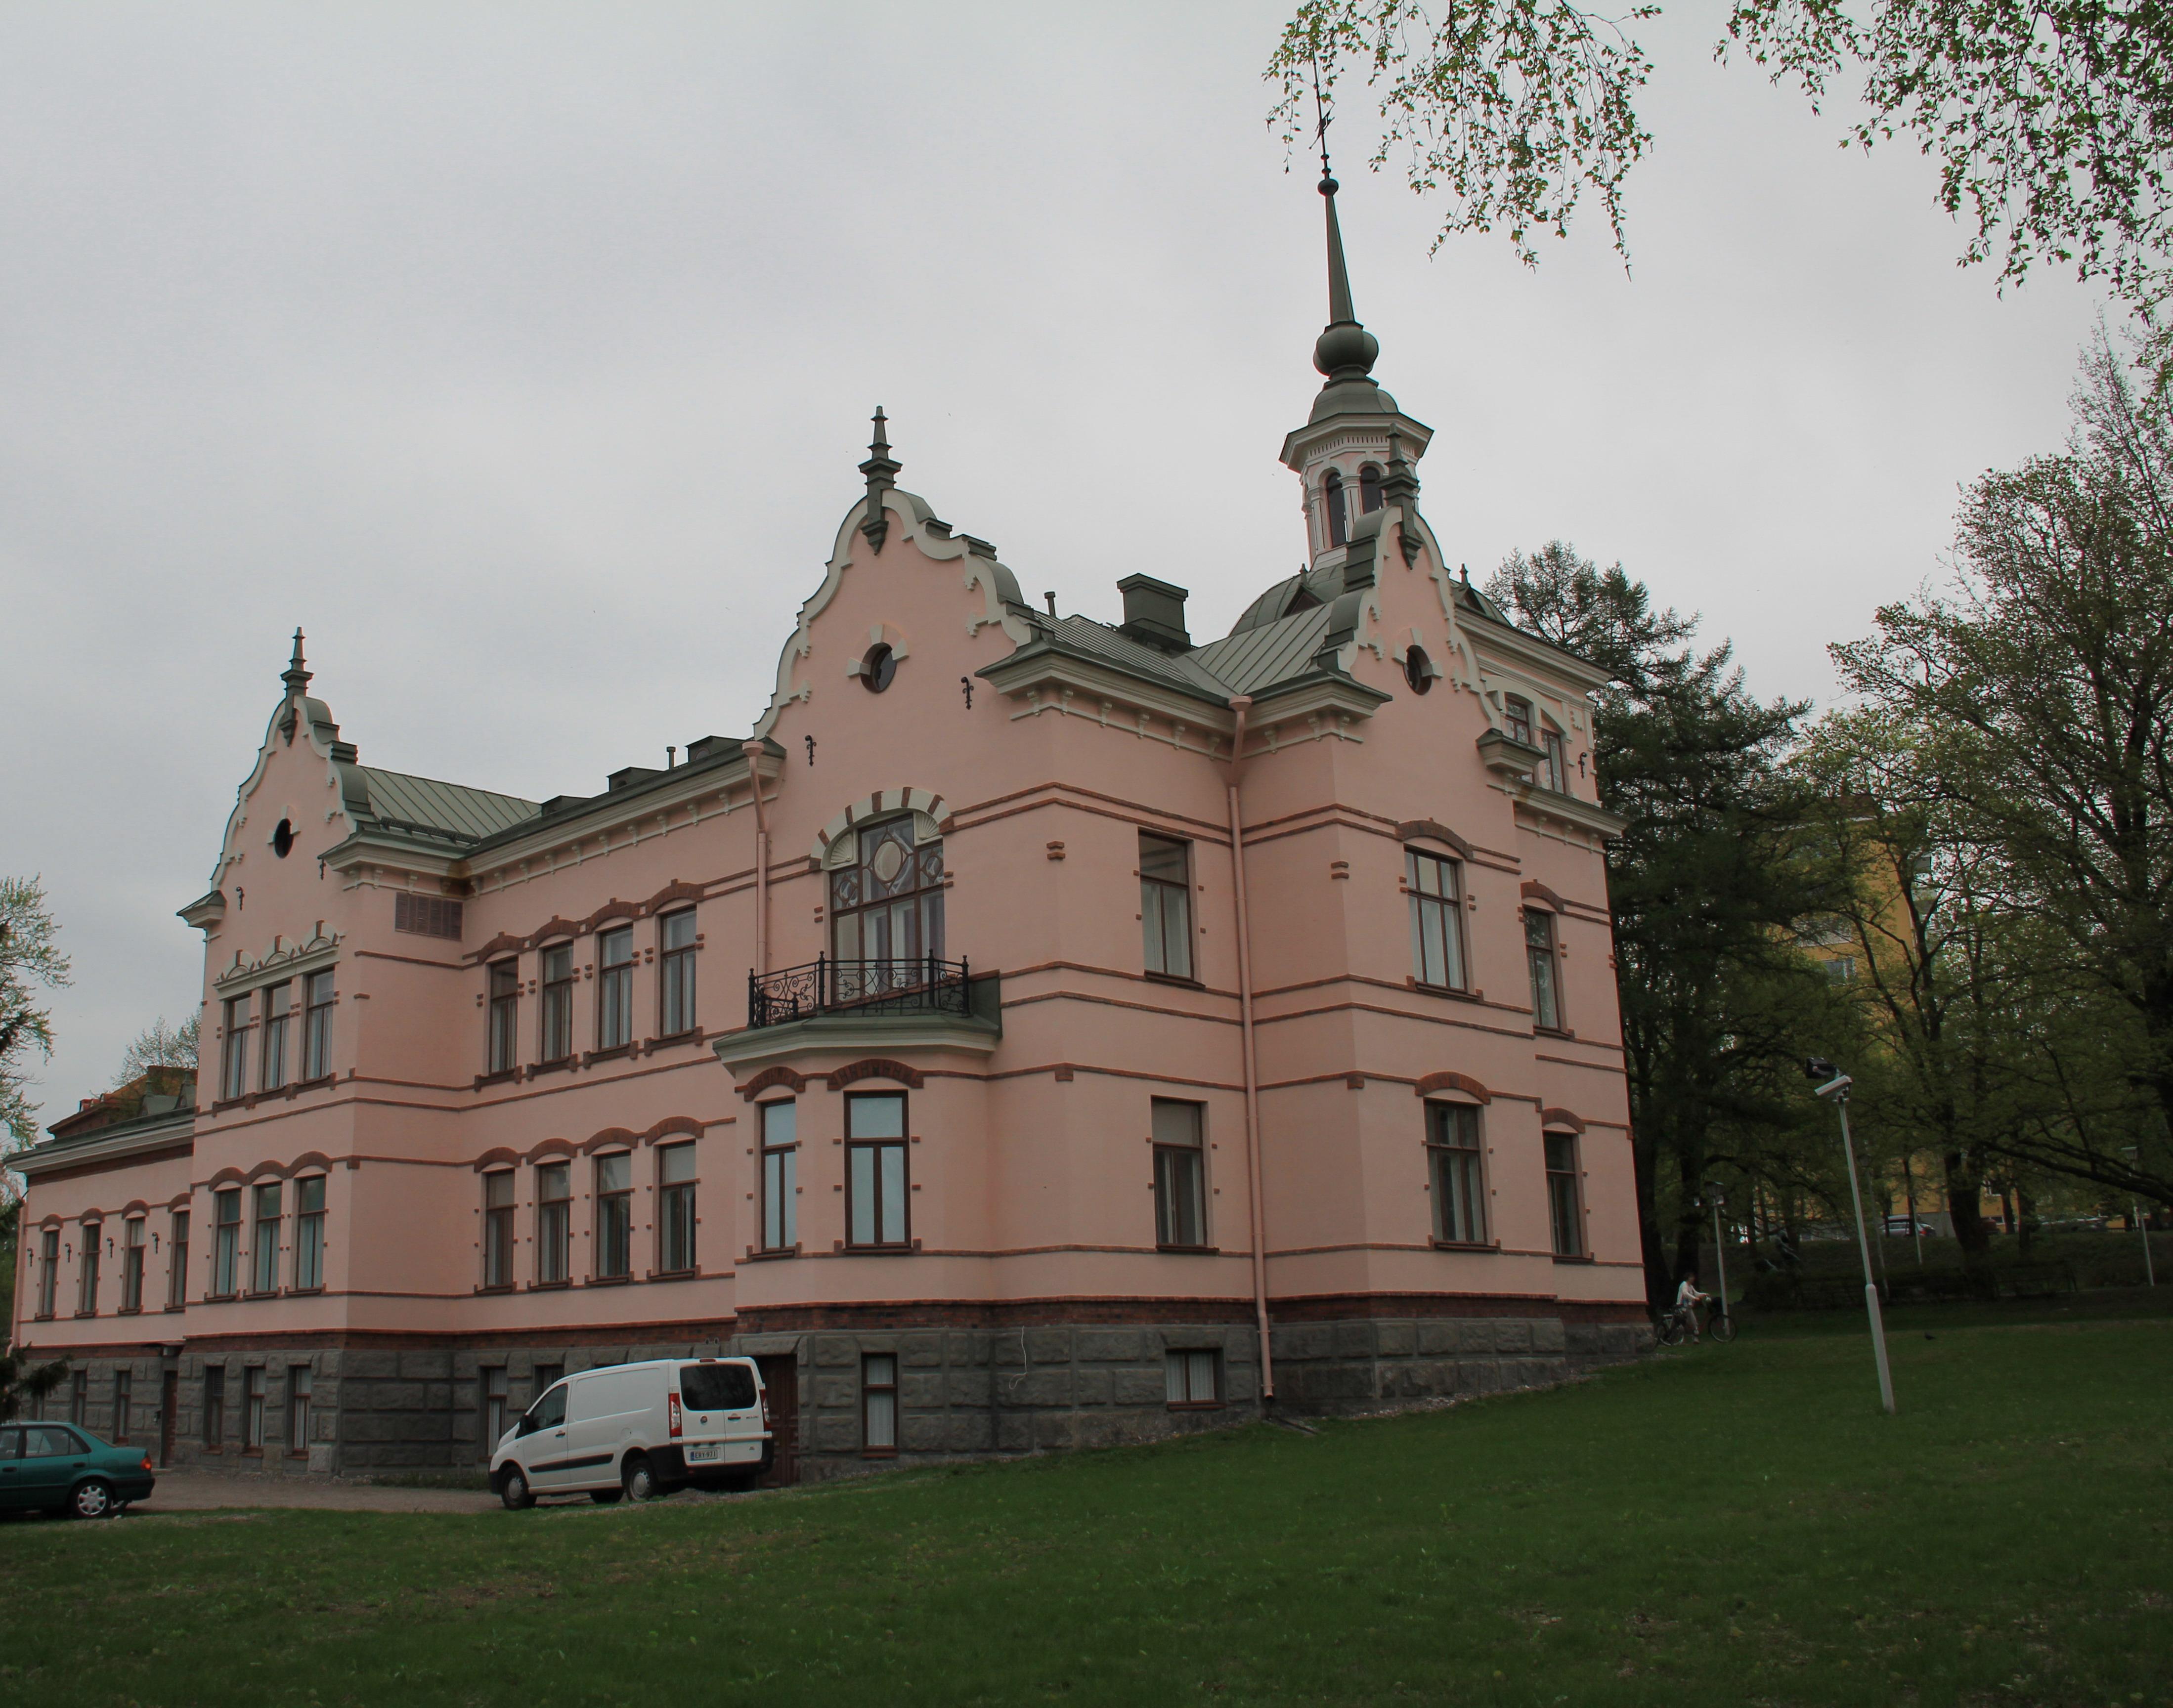 File:Fellmanin kartano Lahti.jpg - Wikimedia Commons